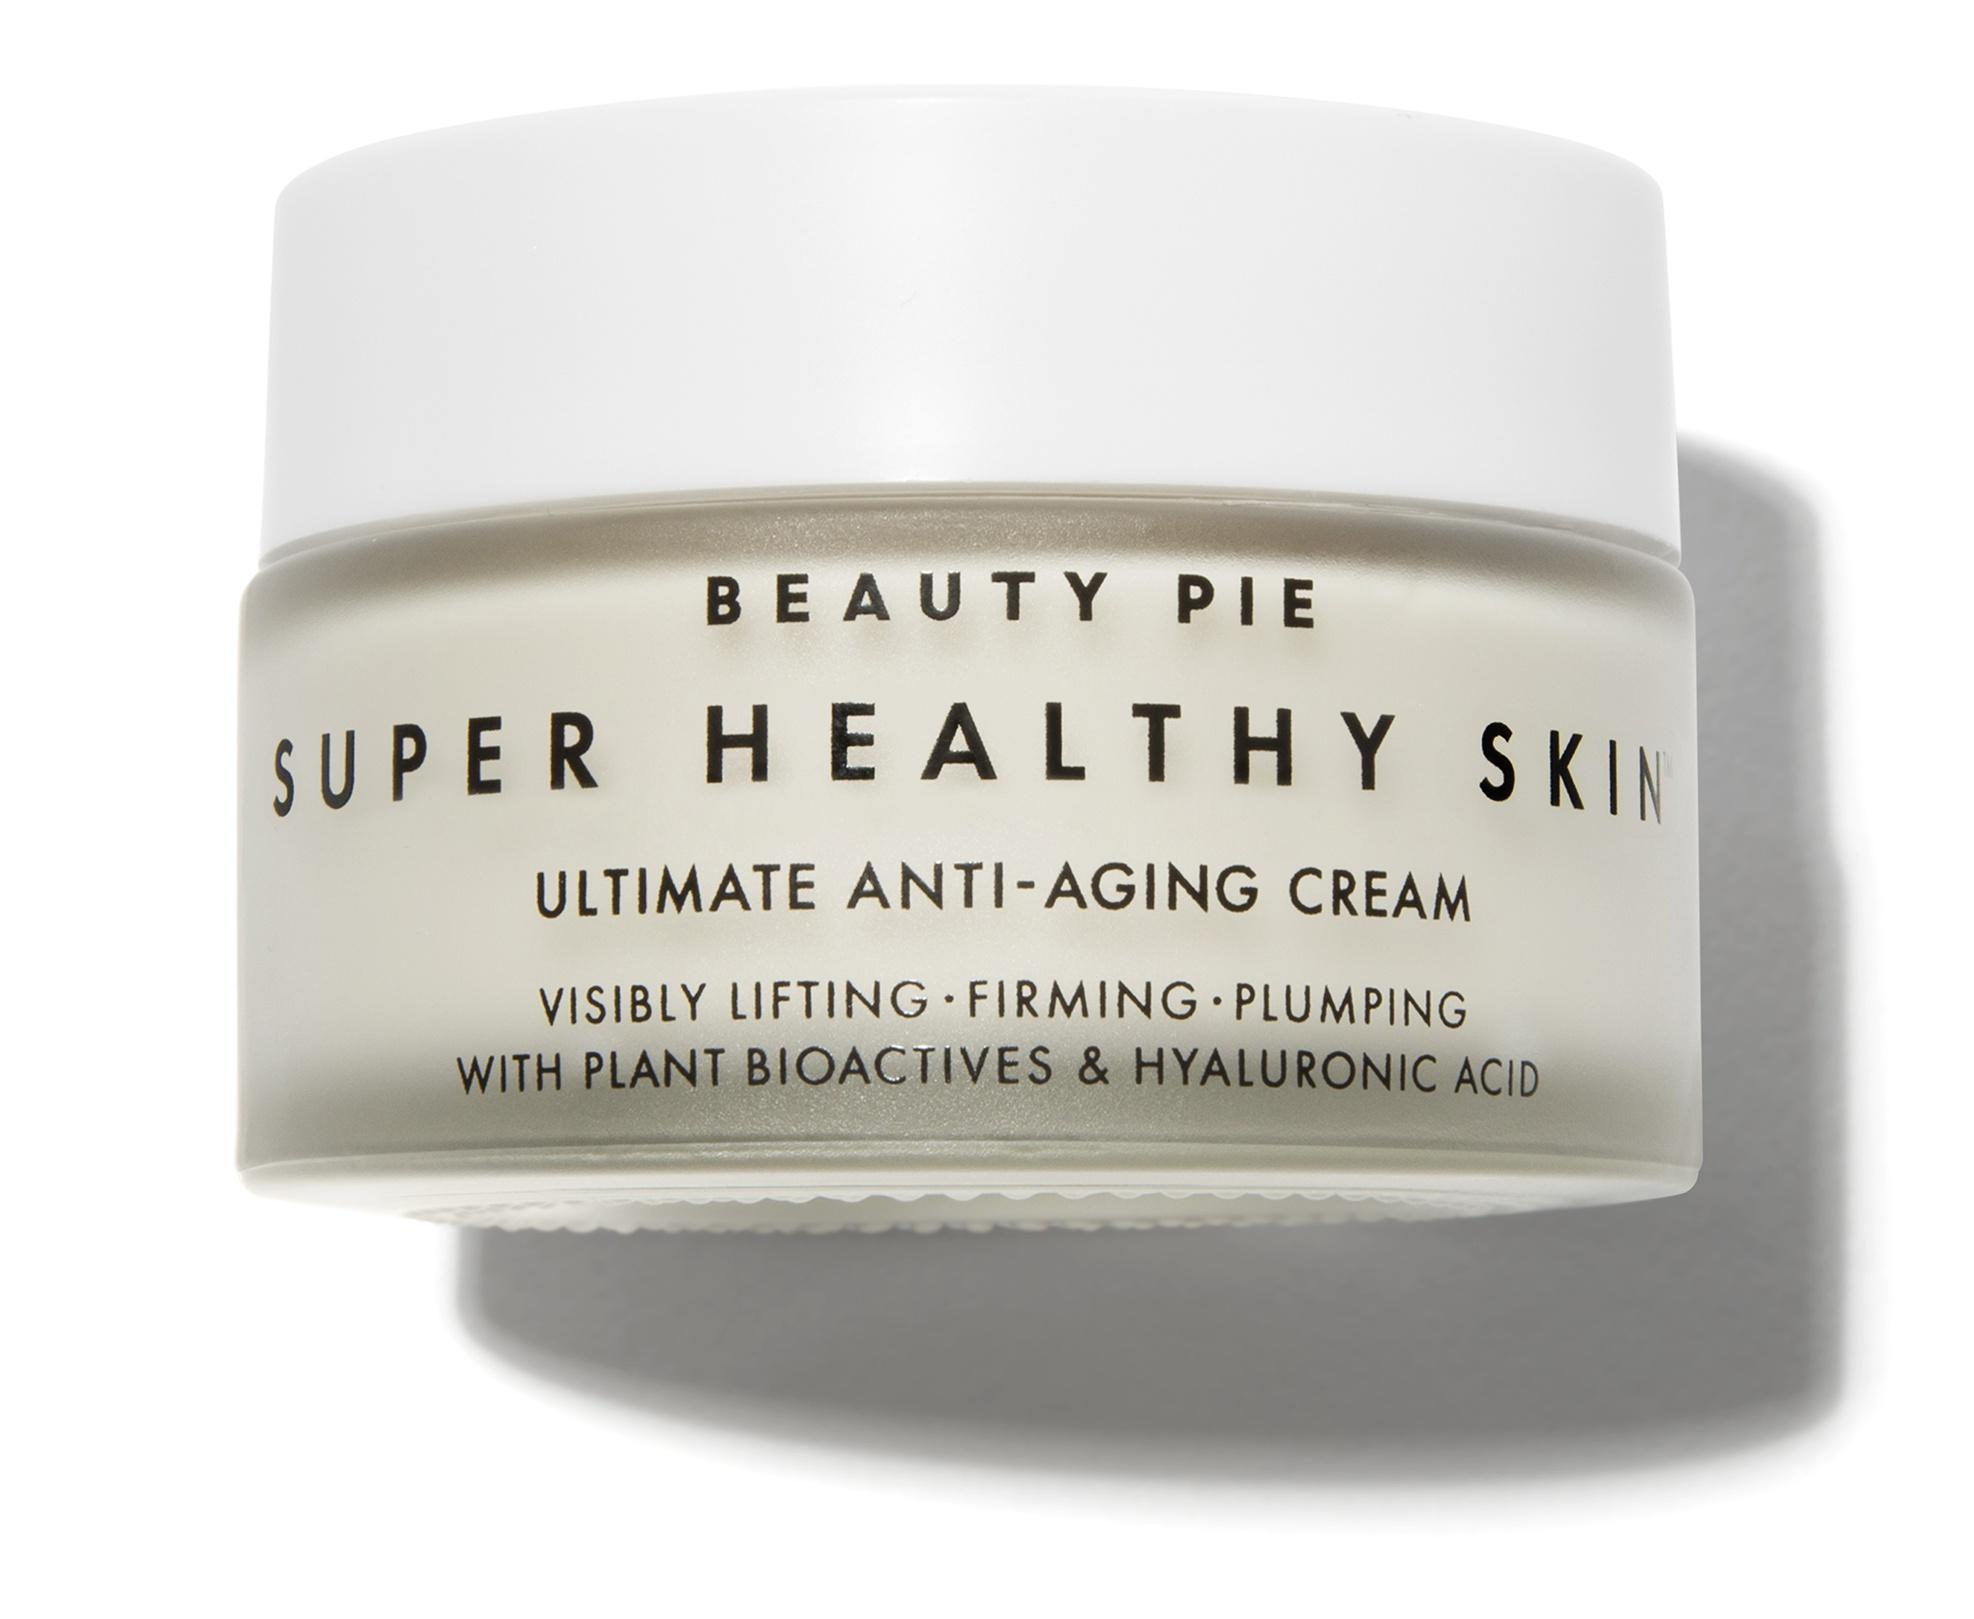 Beauty Pie Super Healthy Skin Ultimate Anti-Aging Cream